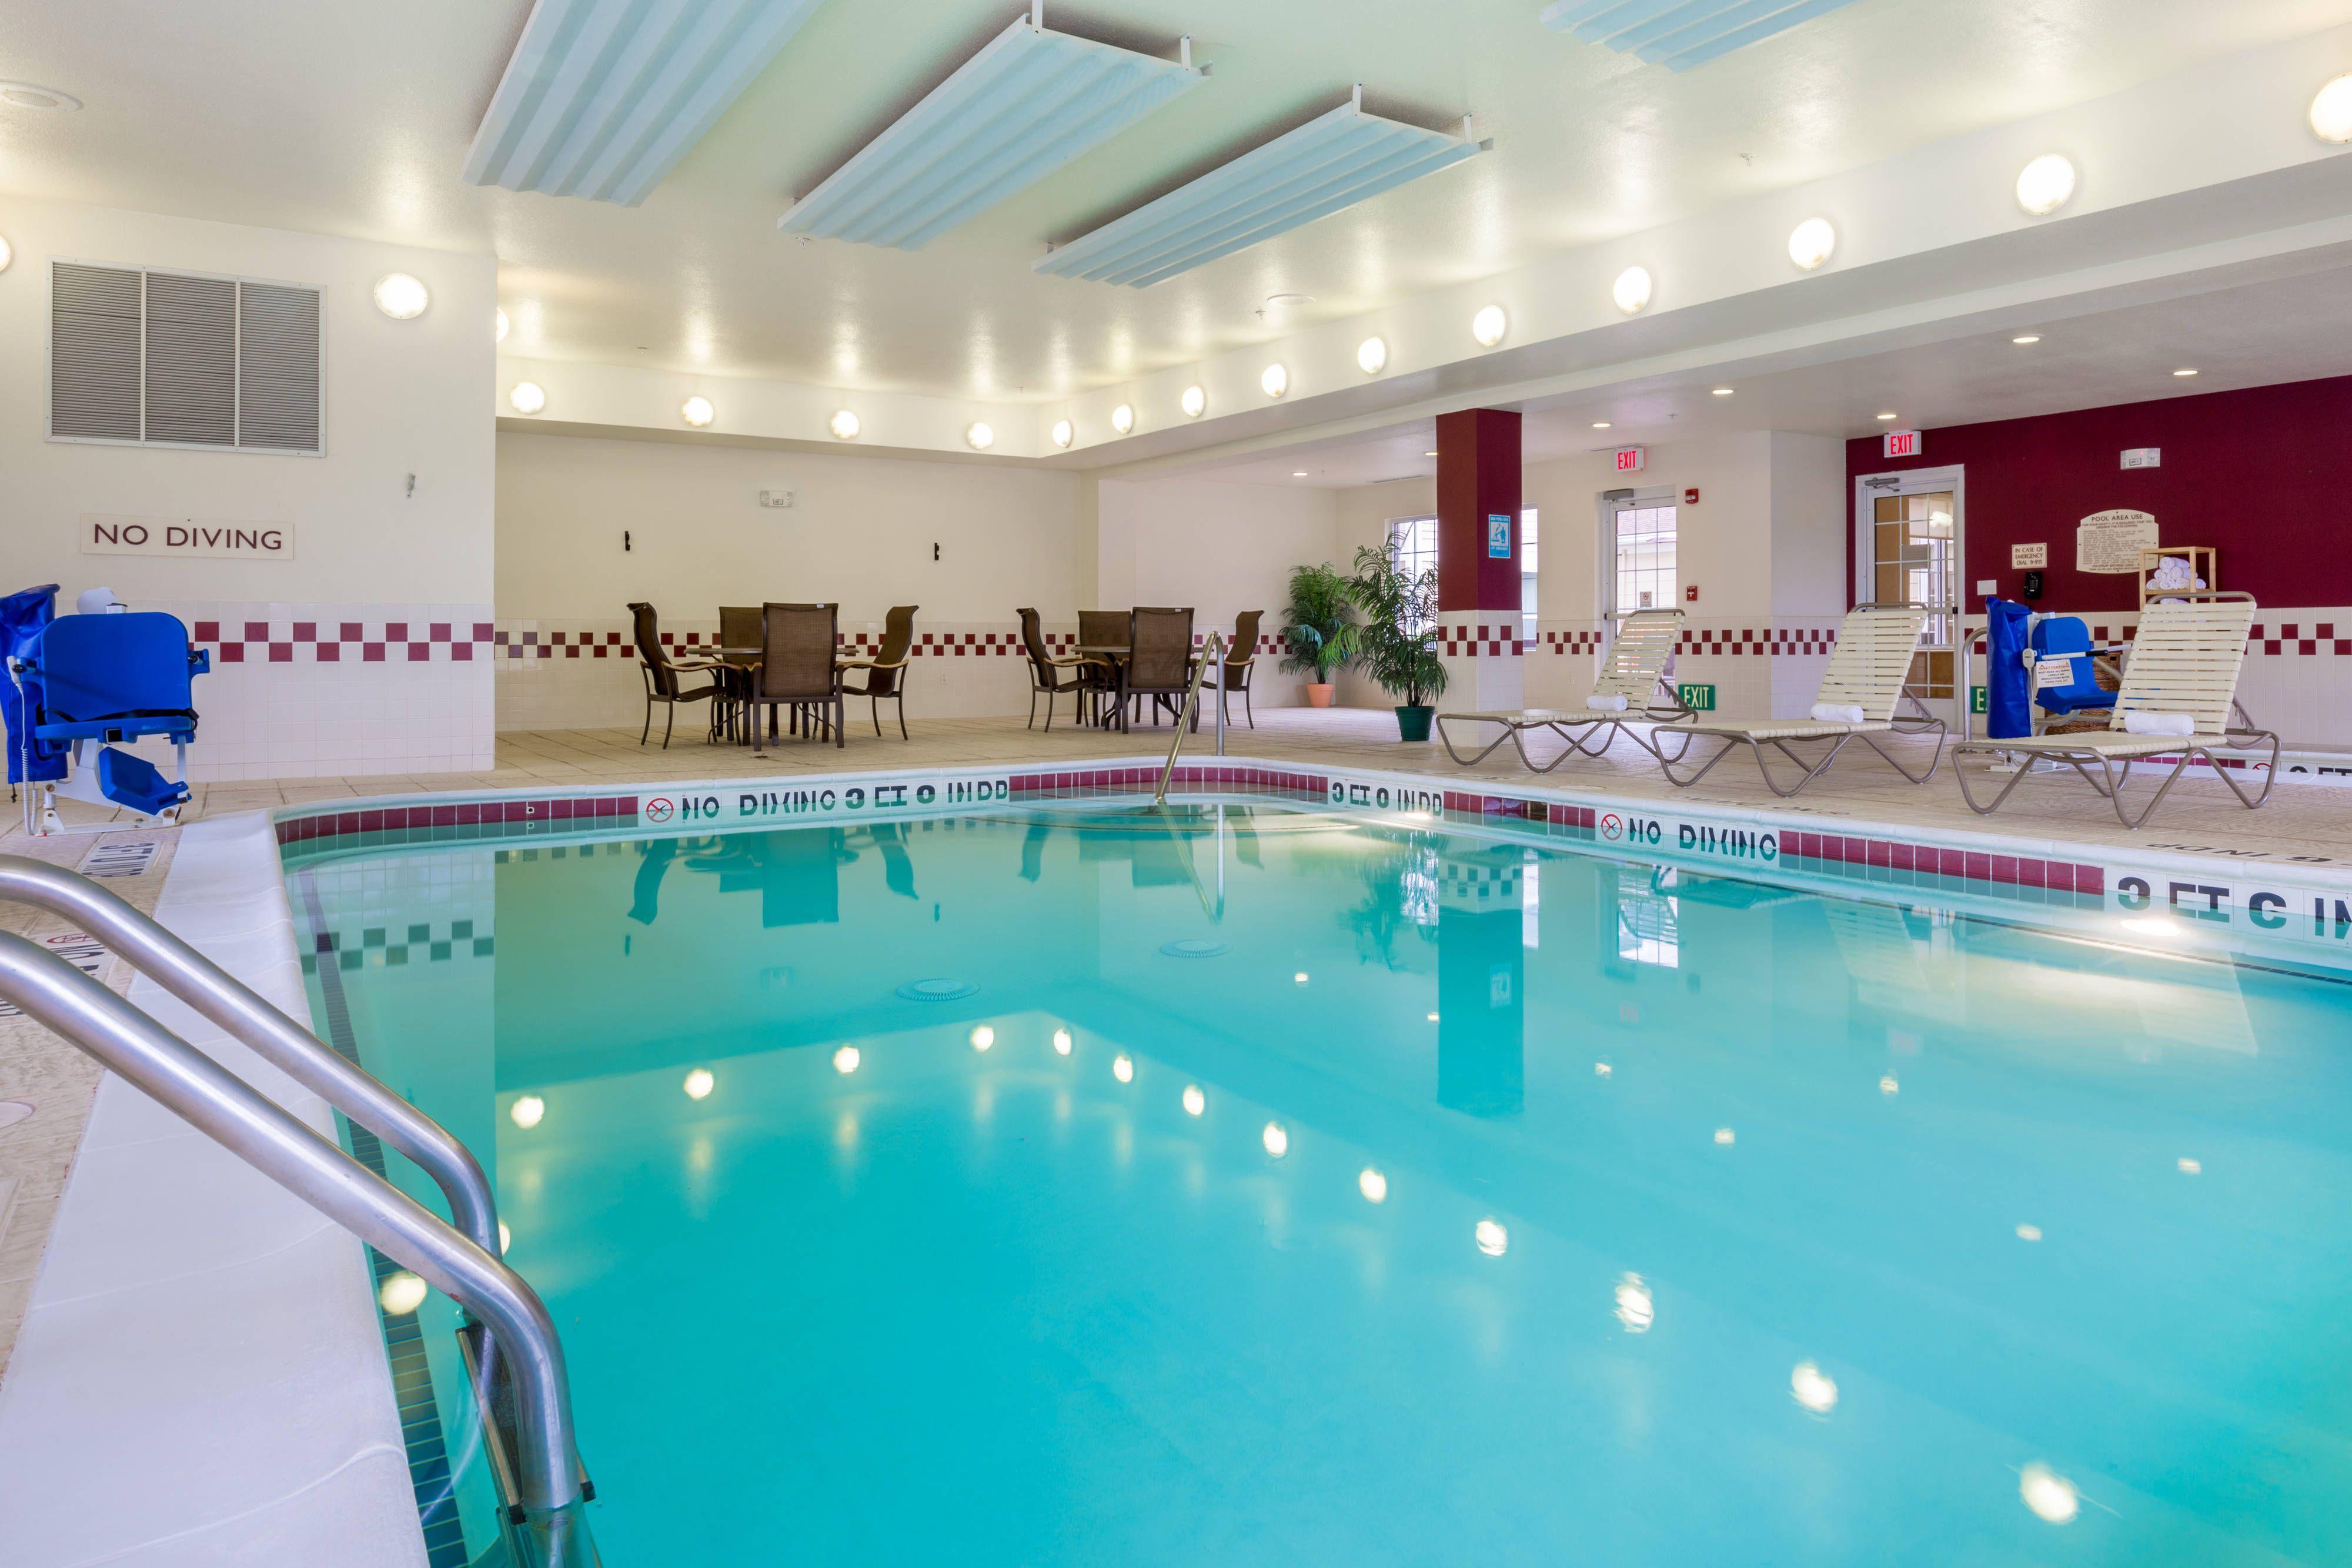 Residence Inn Houston North Indoor Pool Holidays Suite